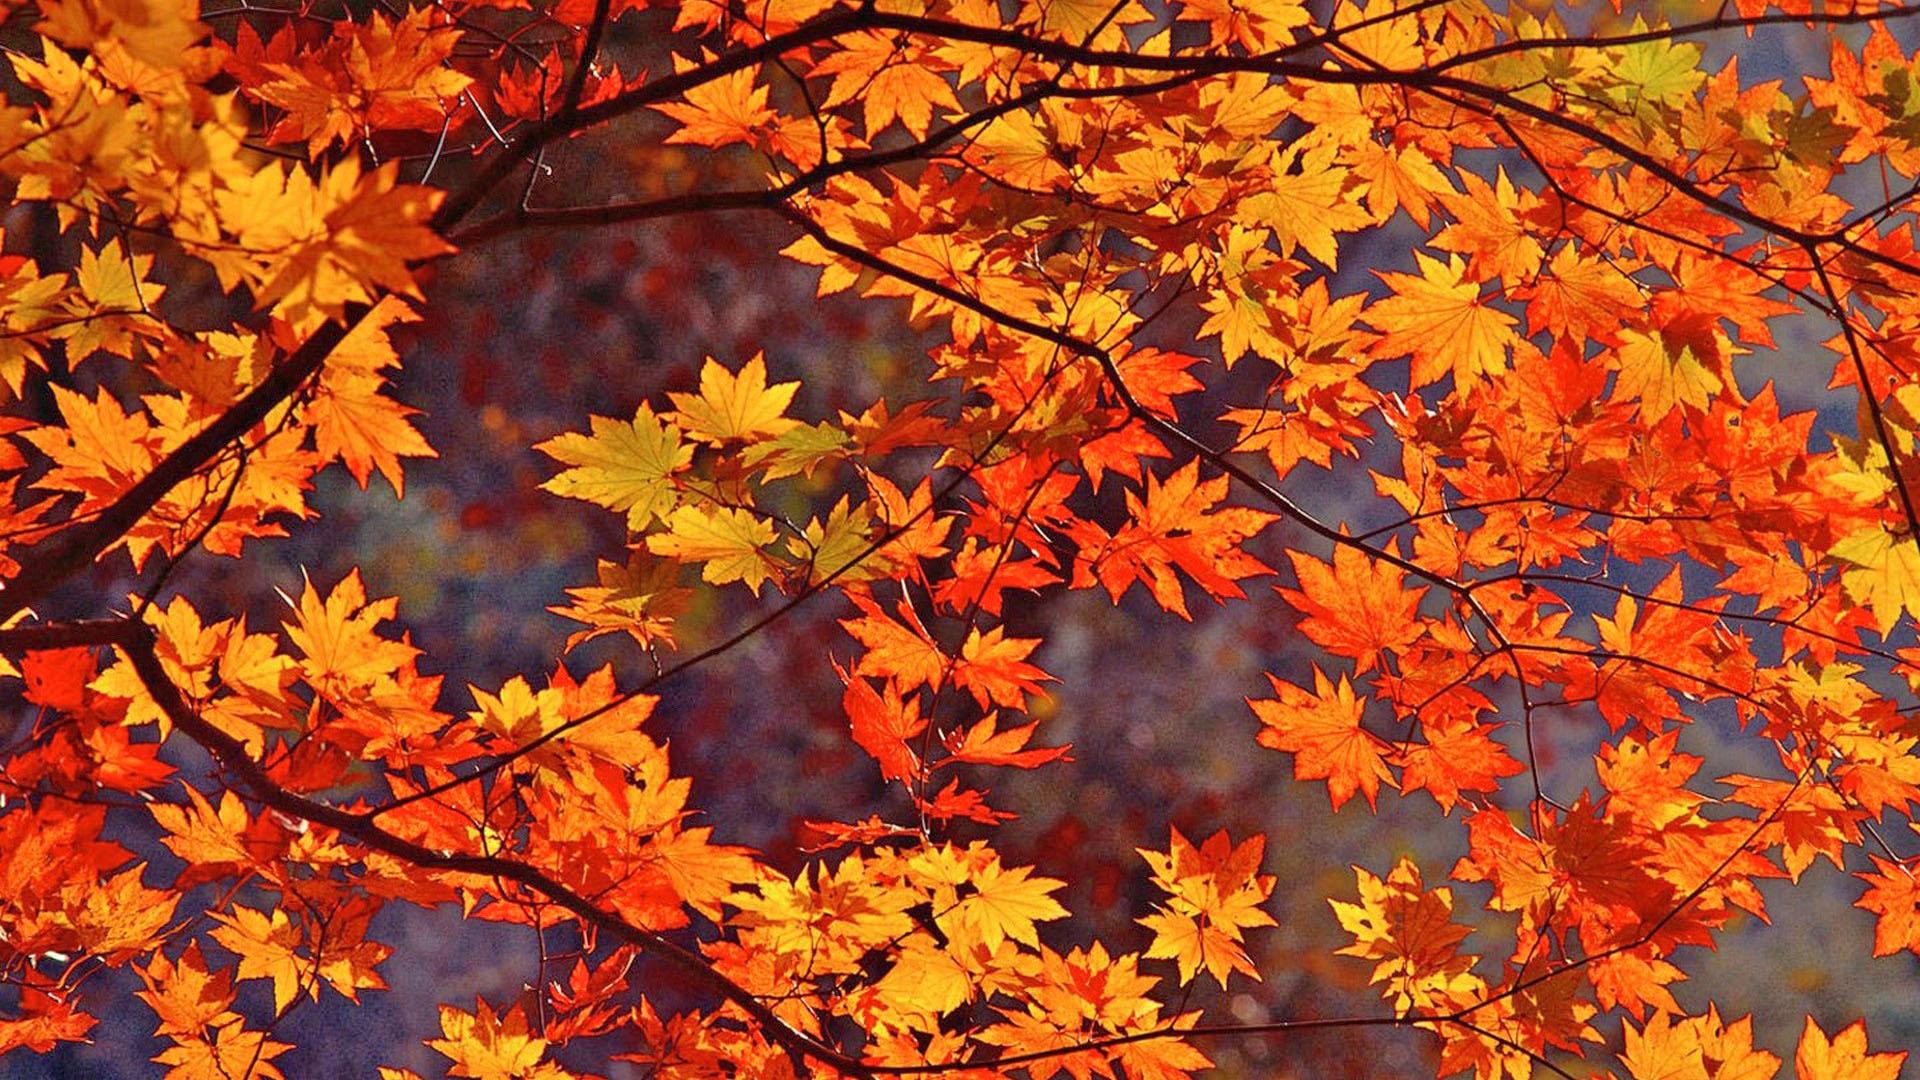 Fall Leaves Wallpaper 1920x1080